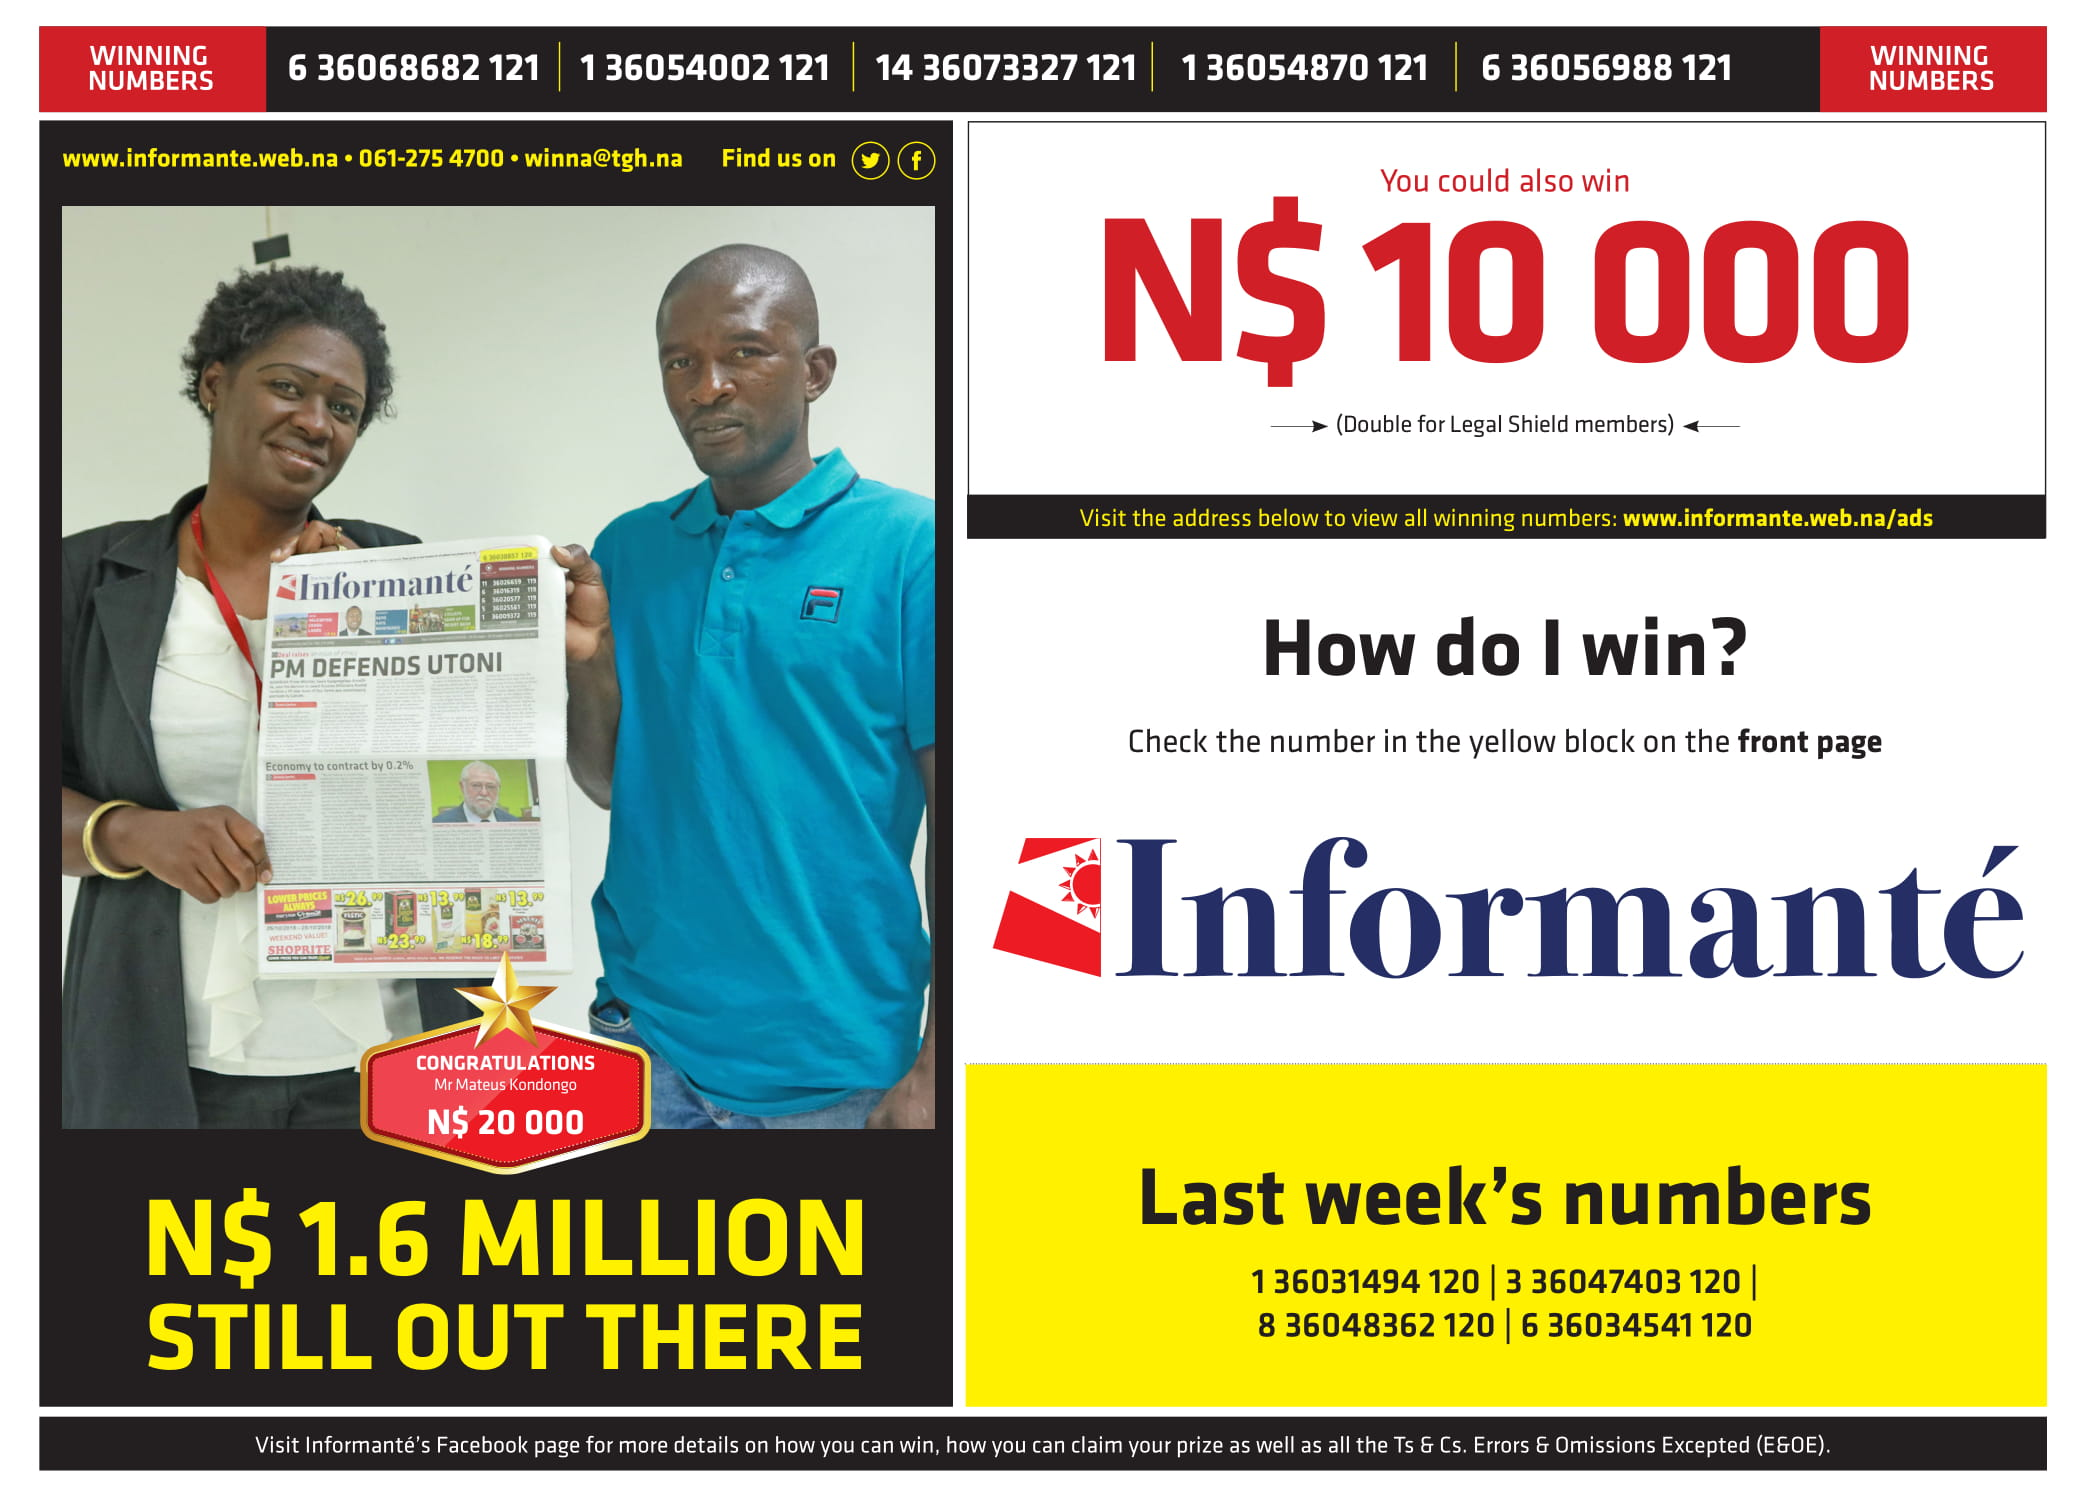 Informante Winning Numbers